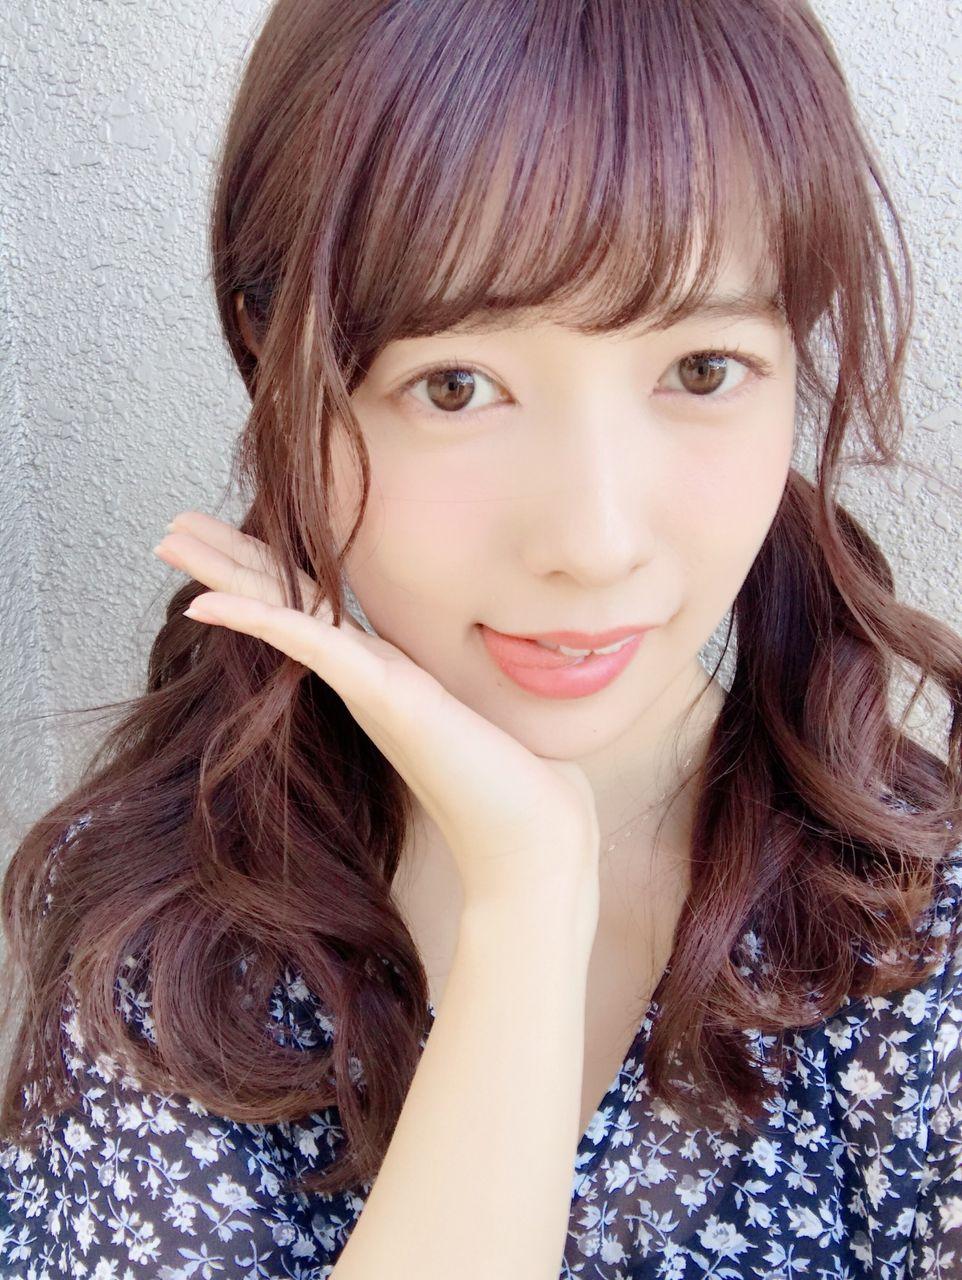 乃木坂46】斉藤優里を最近推し始...